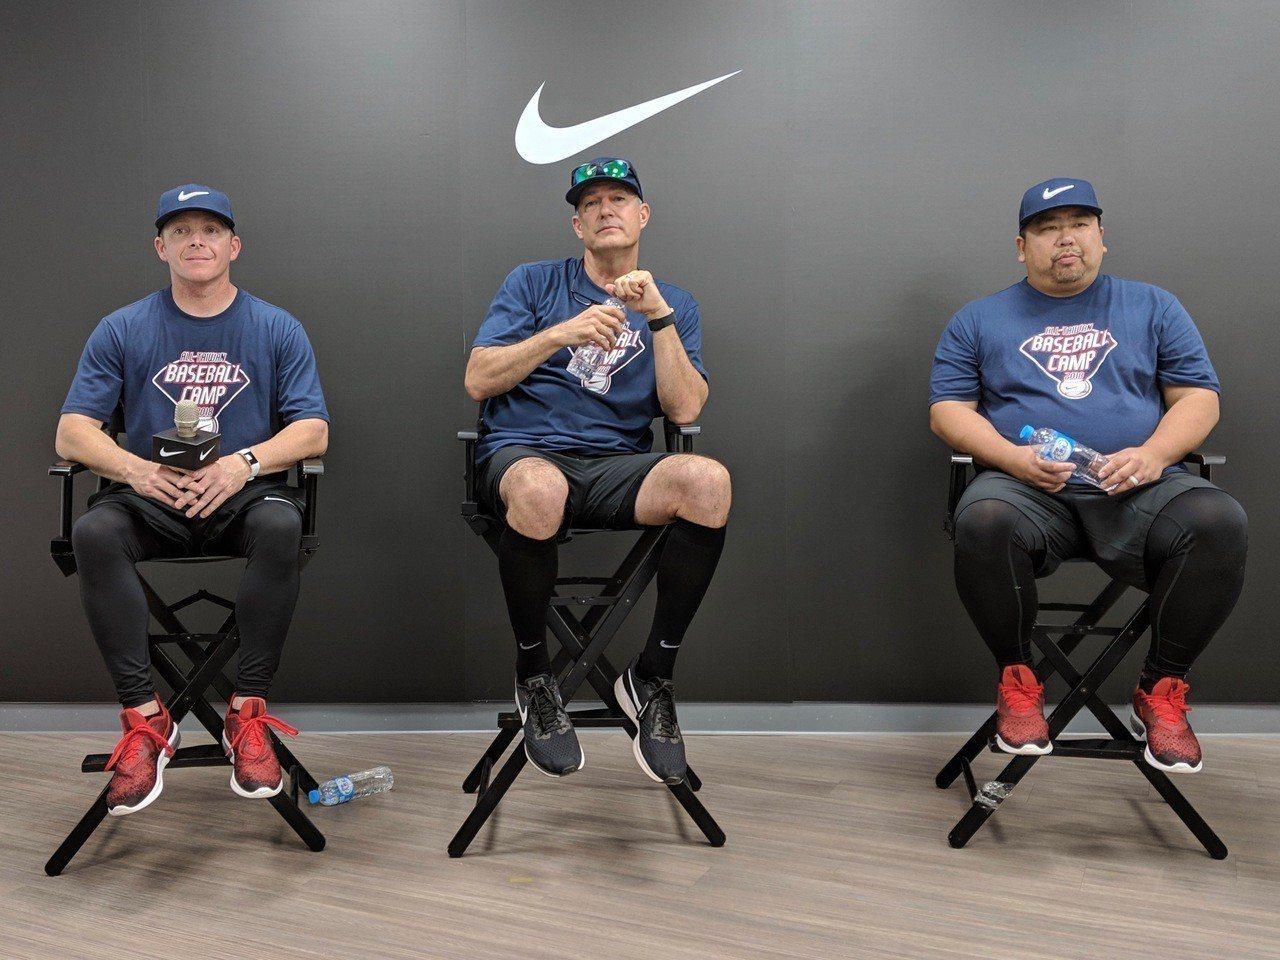 Nike臺灣青棒菁英訓練營開幕,訓練營總監范斯特(Darren Fenster,...